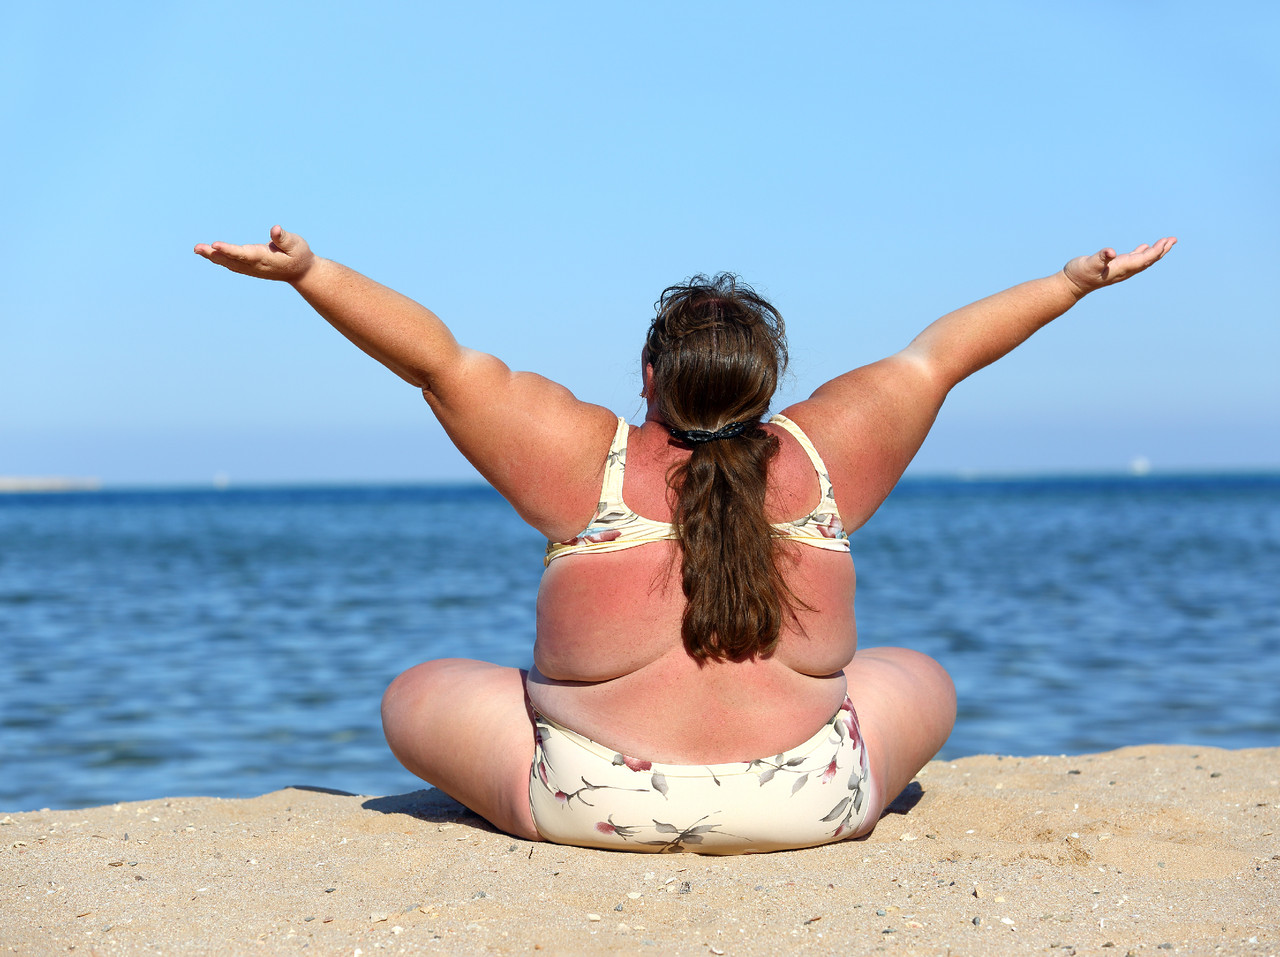 lady-on-beach.jpg